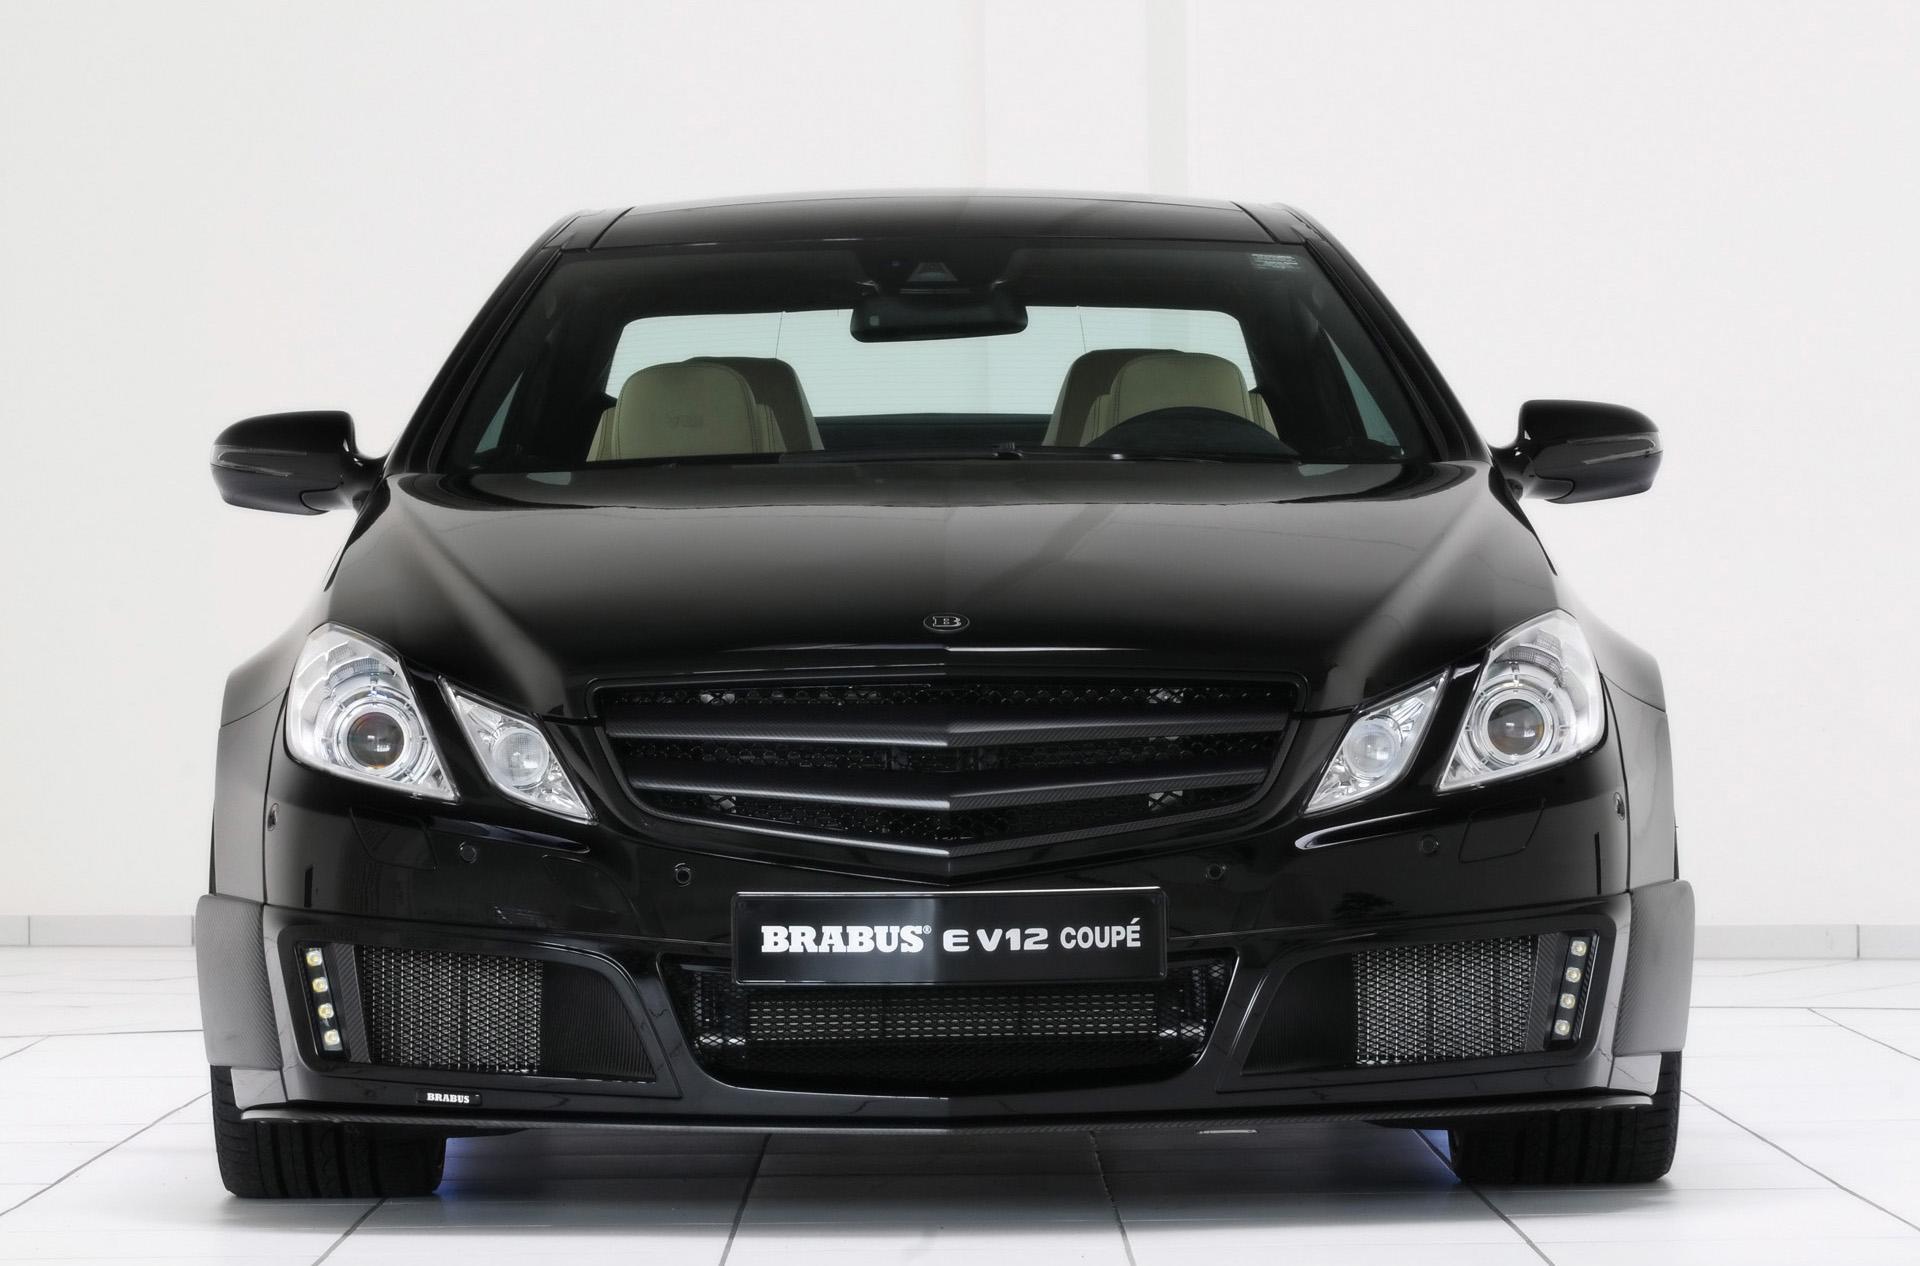 Mercedes Benz Minivan >> 2010 Brabus E V12 Coupe News and Information